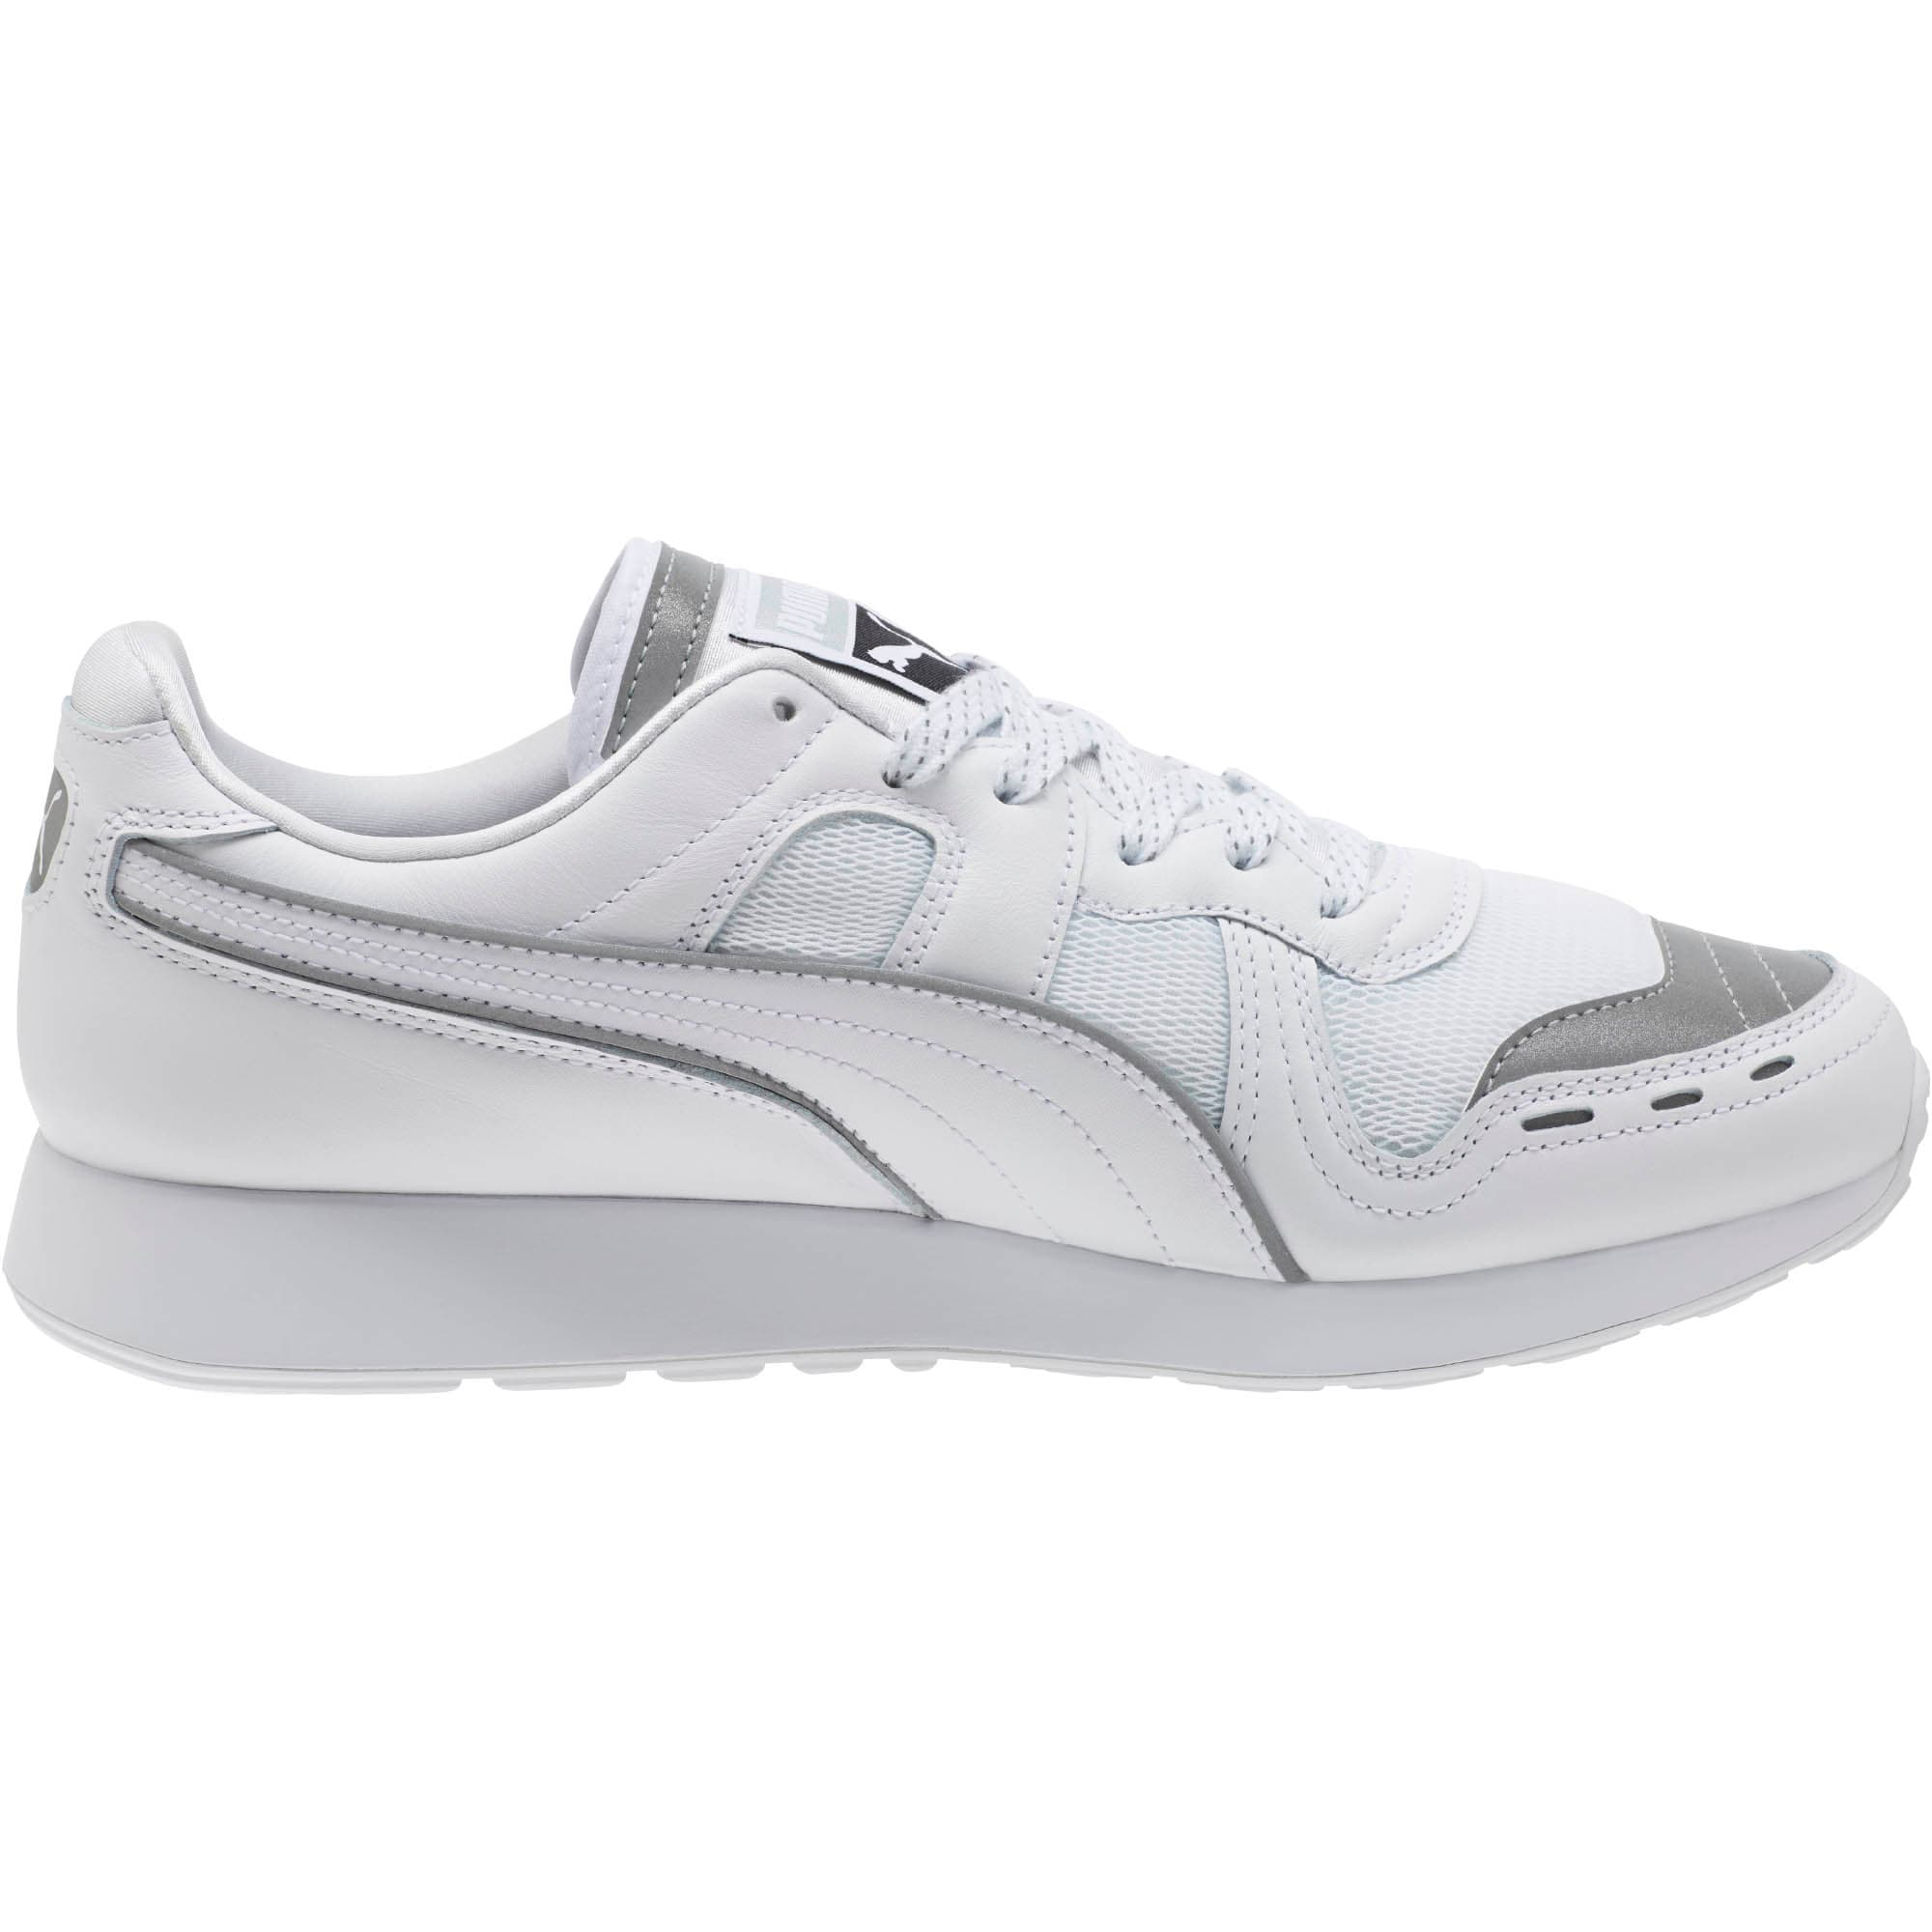 Thumbnail 3 of RS-100 Optic Men's Sneakers, P White-P Silver-Puma White, medium